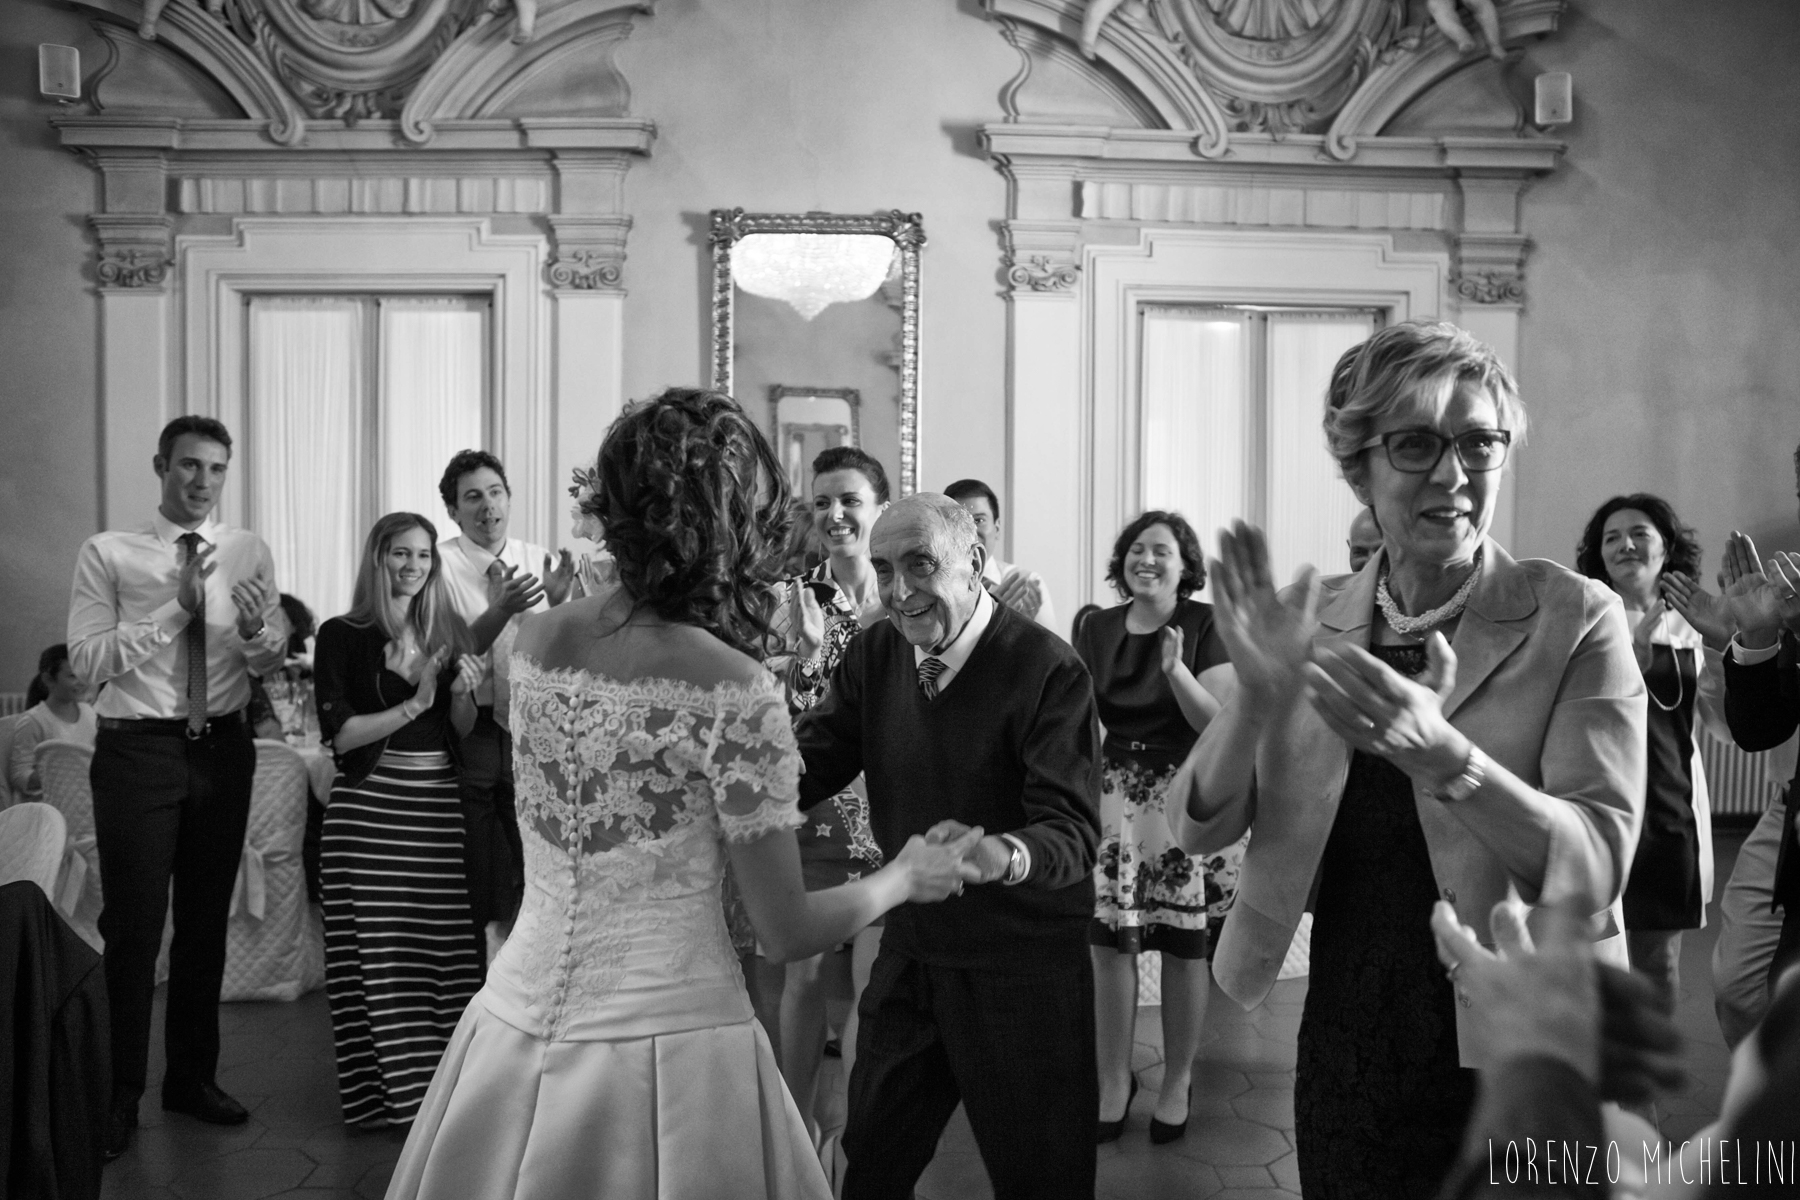 wedding-photographer-reportage-scattidamore-italy-83